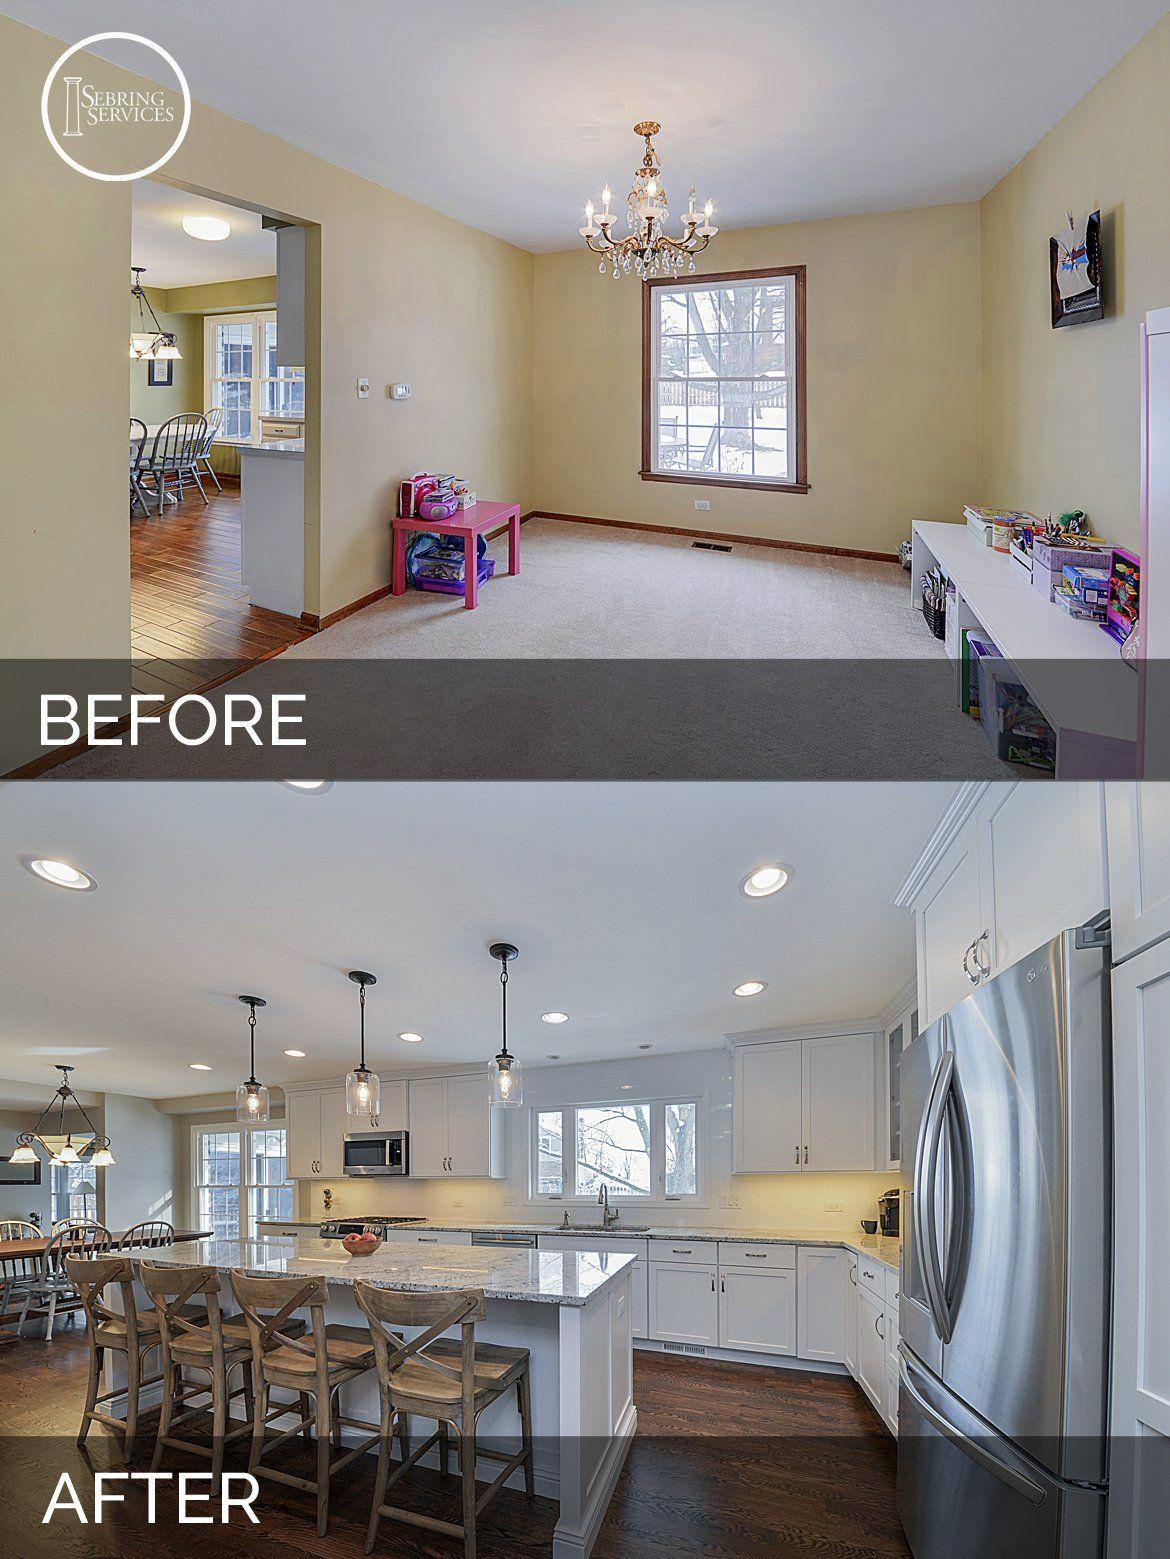 Kitchen Decor | Before After Interior Design | Pinterest | Design ...